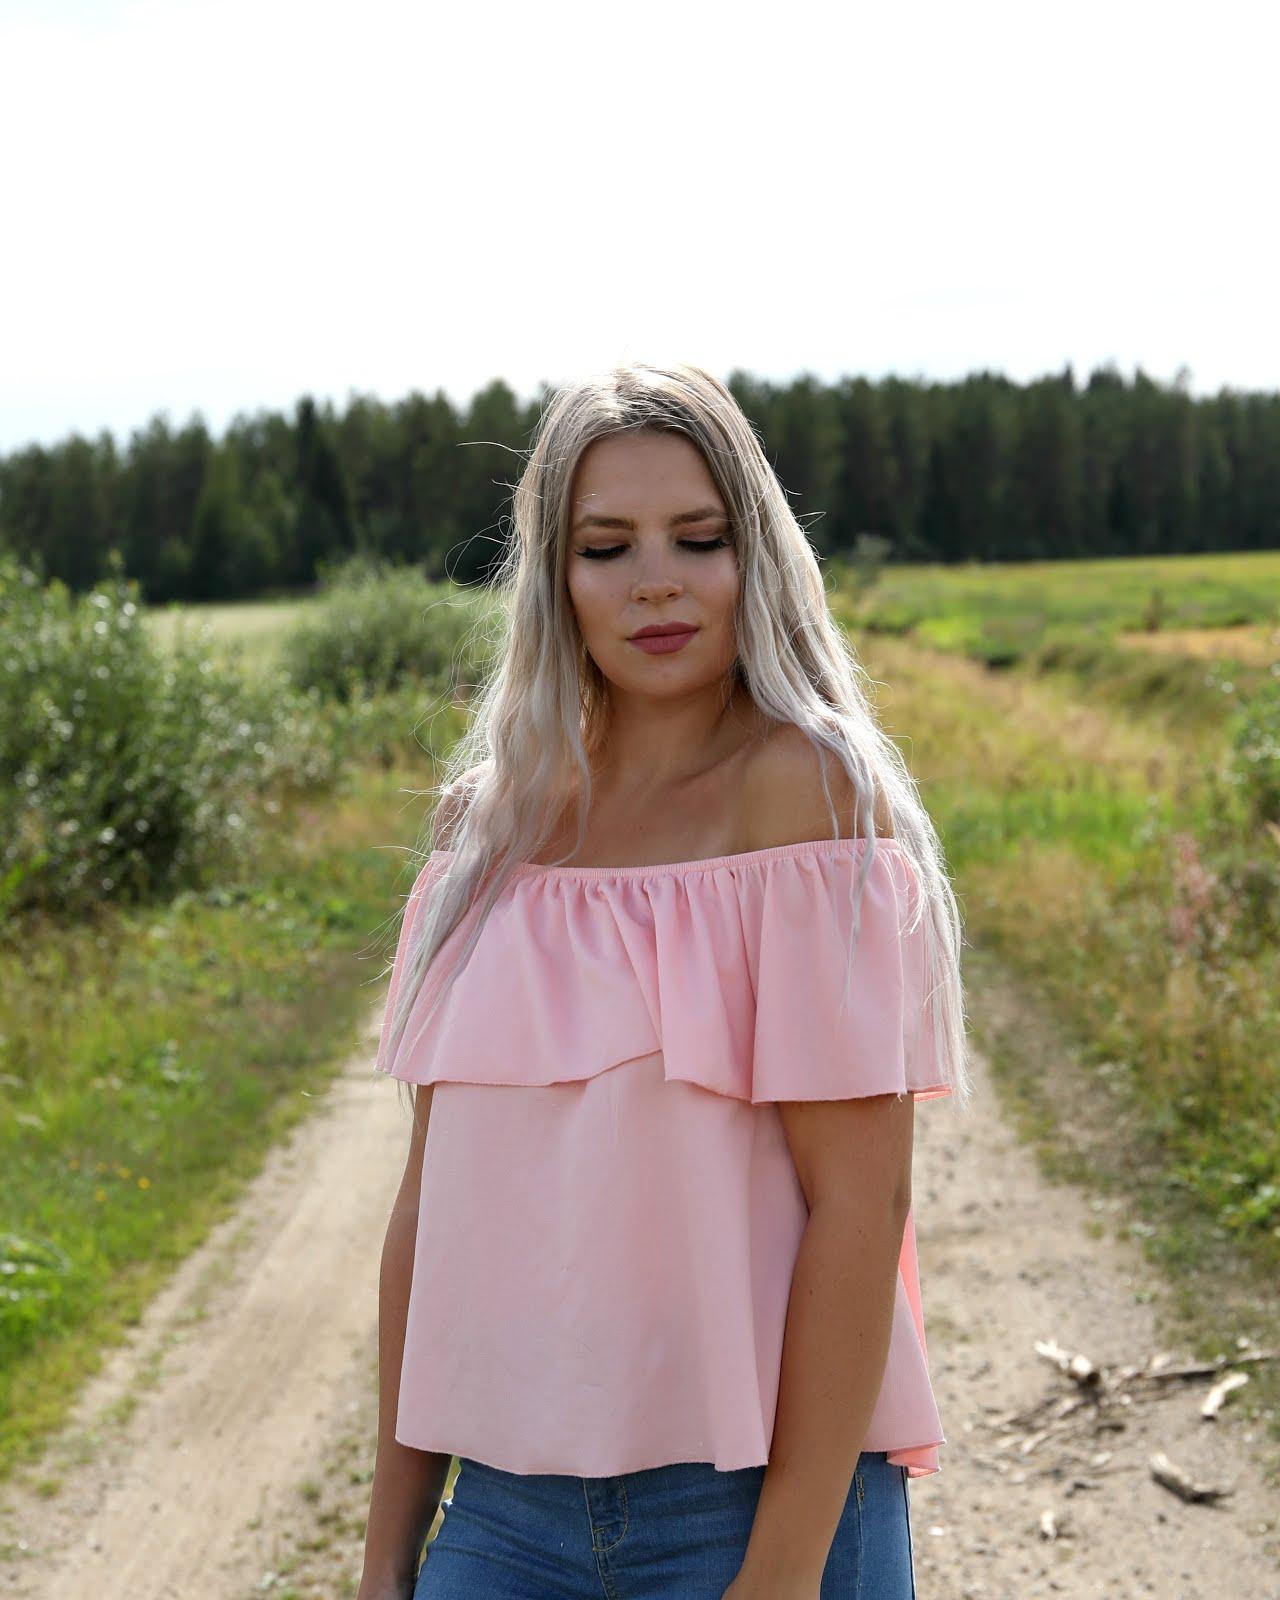 Julia Jokiniemi